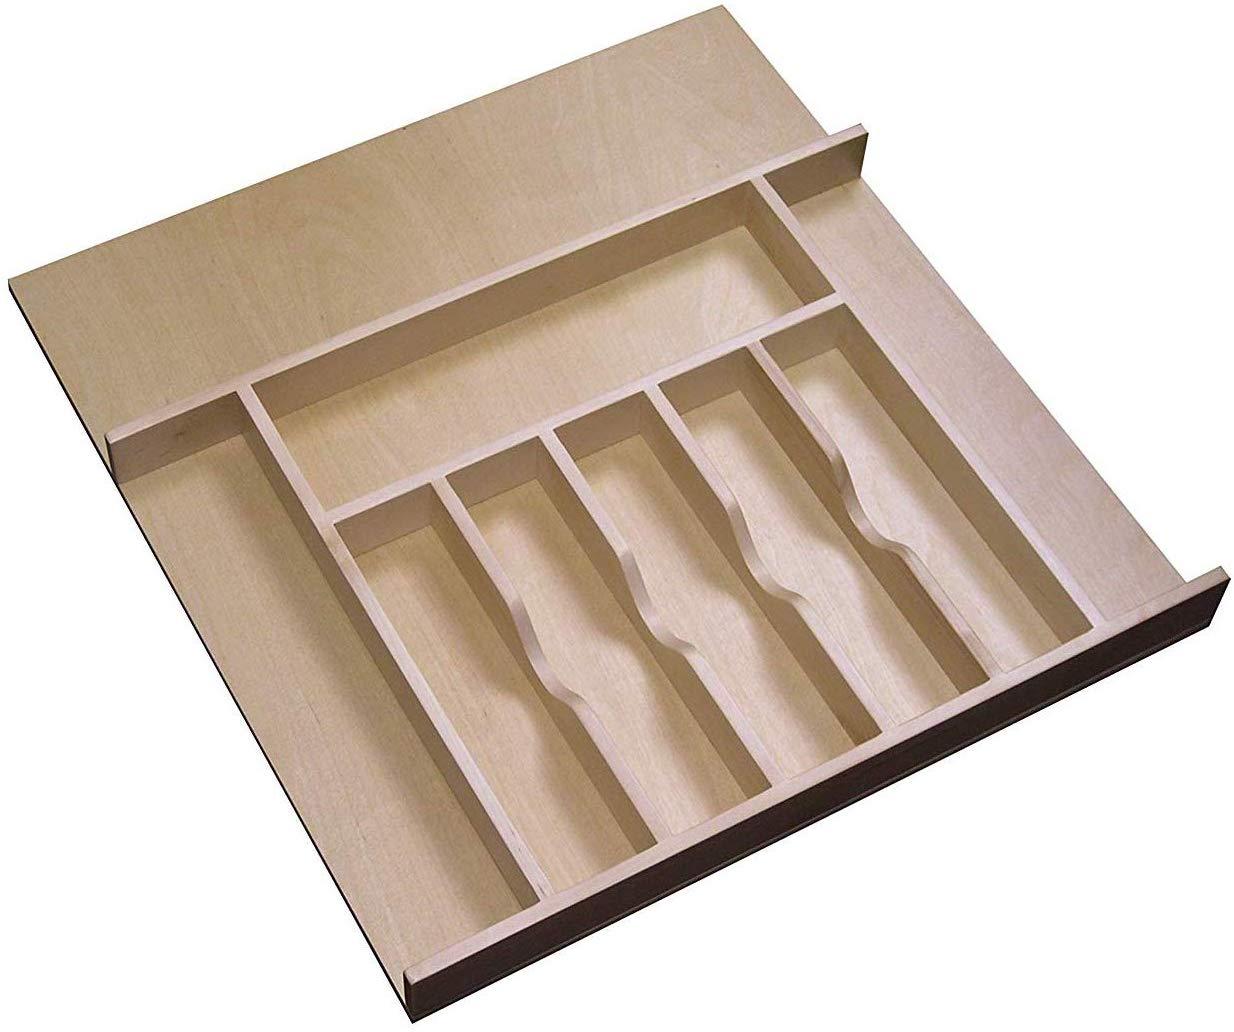 Wooden Cutlery Tray